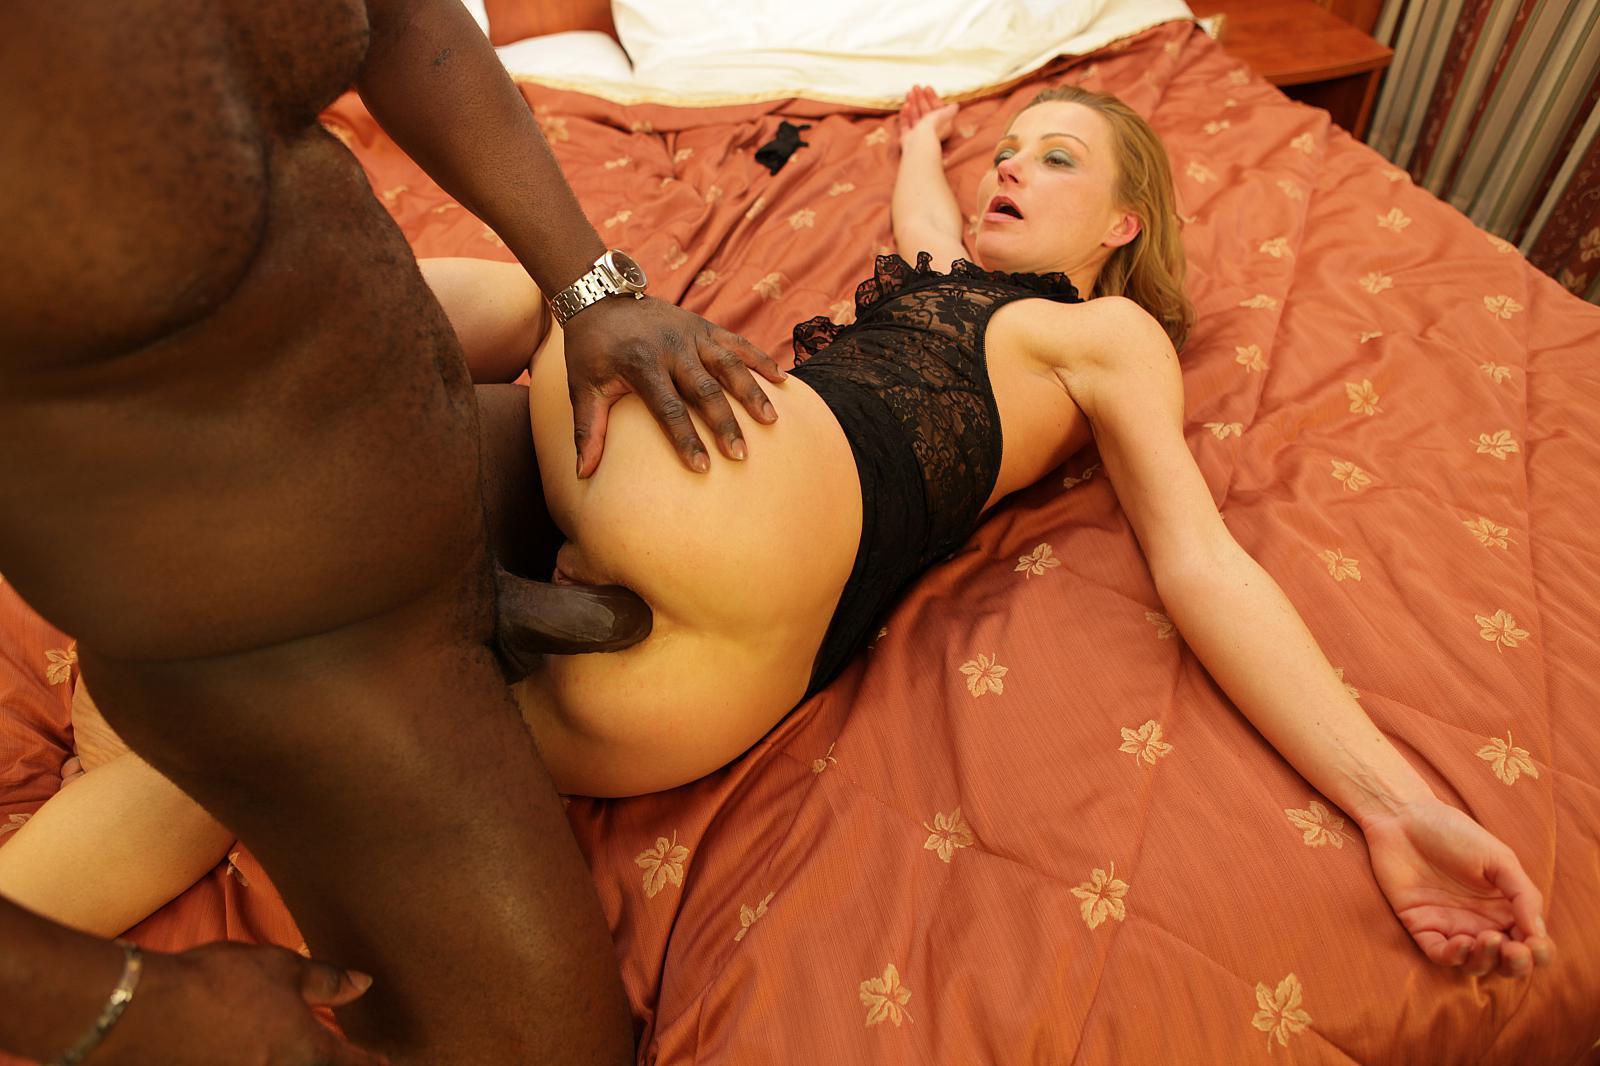 Russian Interracial Porn Galery